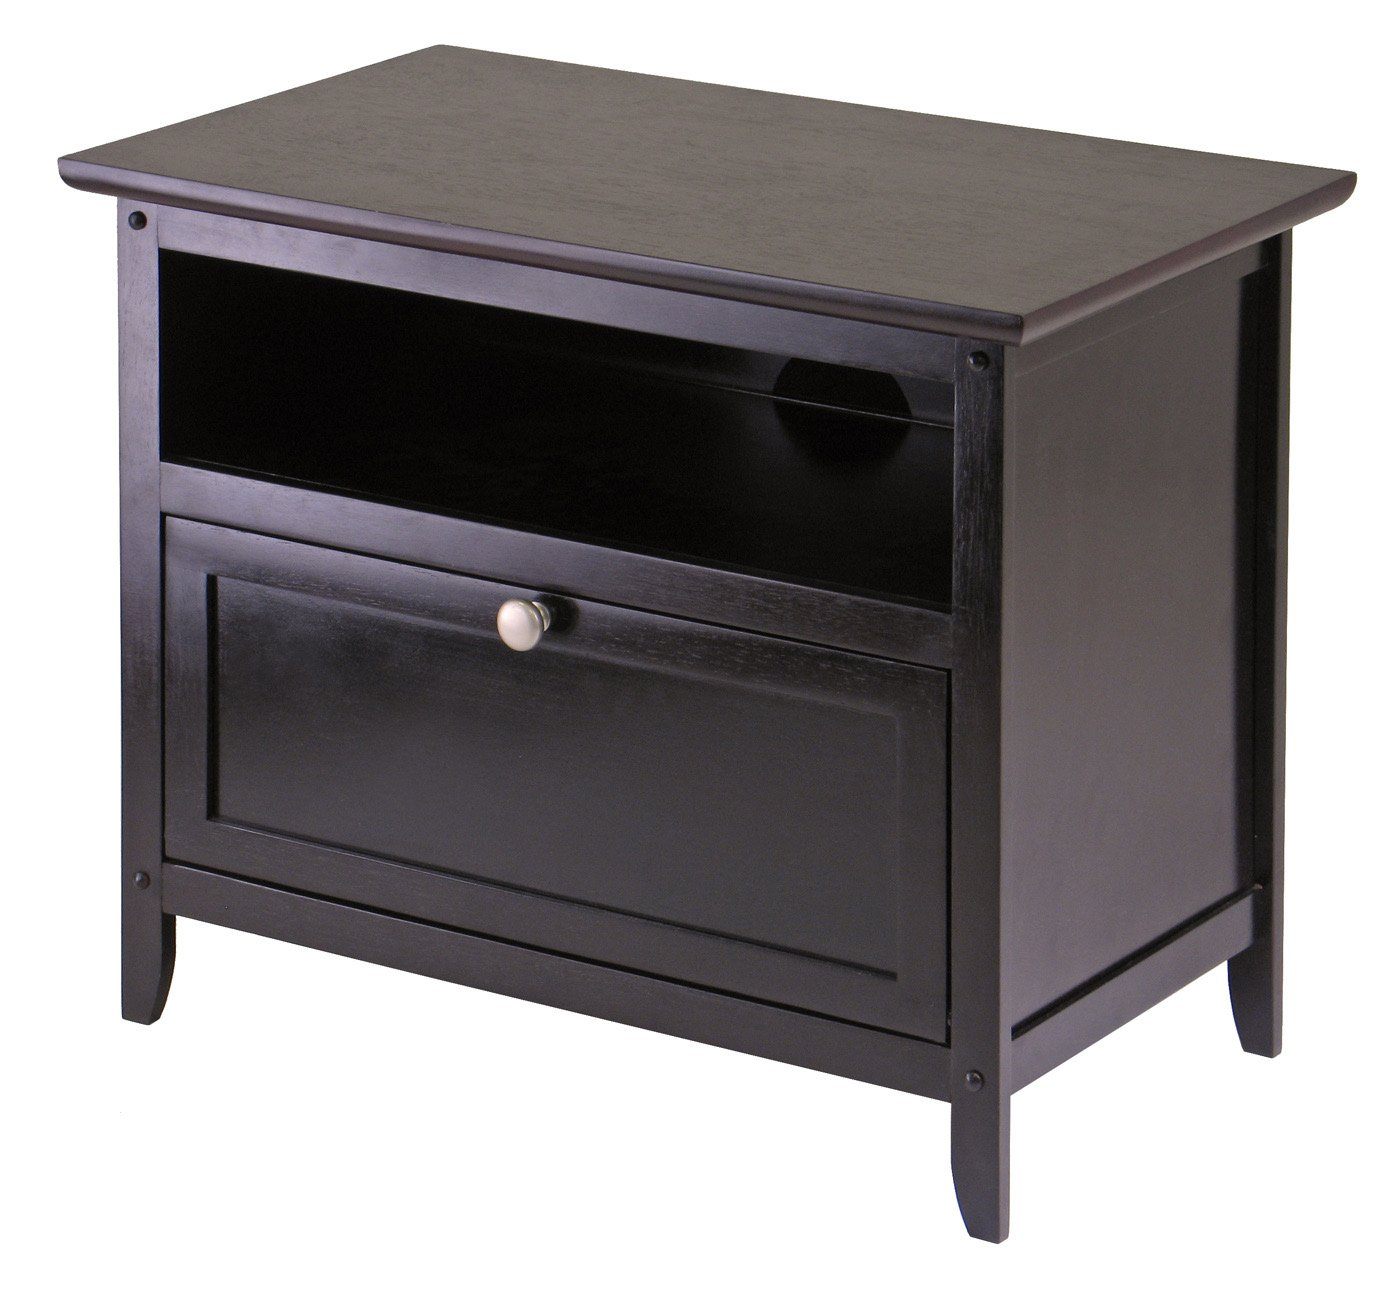 Winsome Wood Zara 25-Inch TV Stand